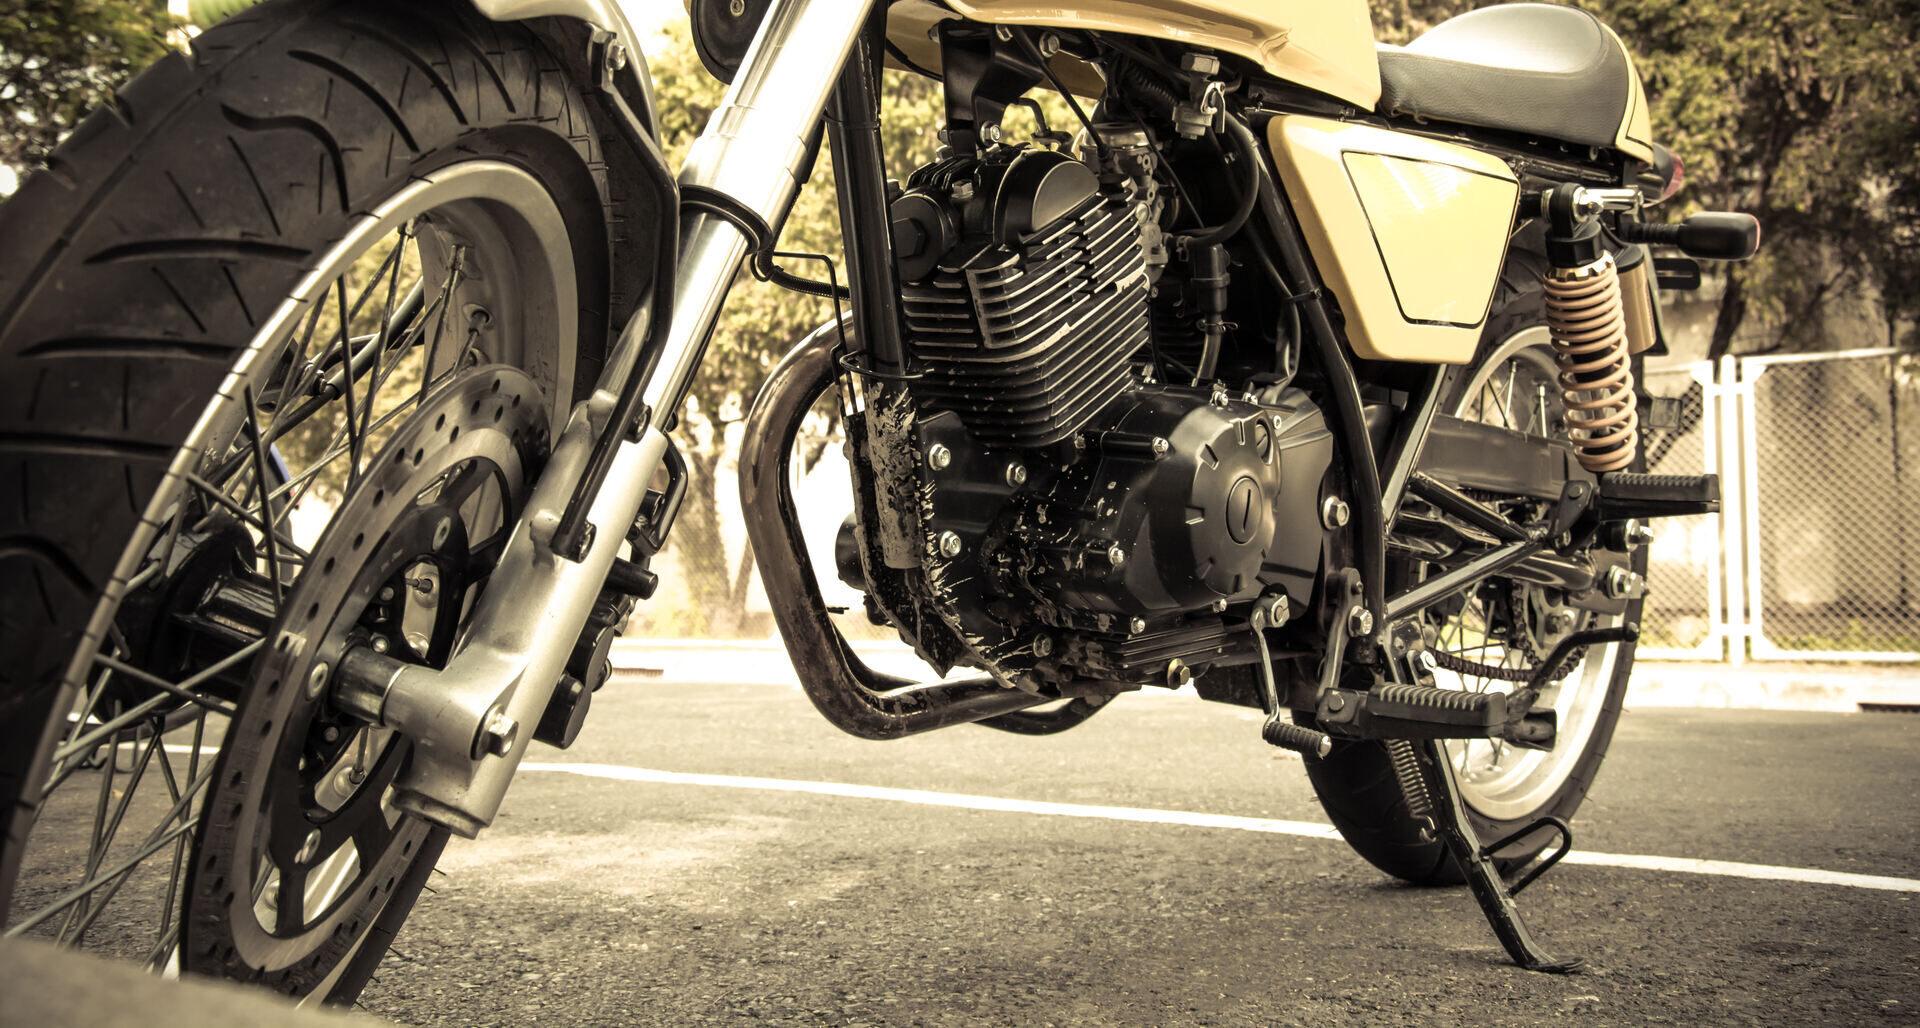 Ontario Motorcycle Insurance